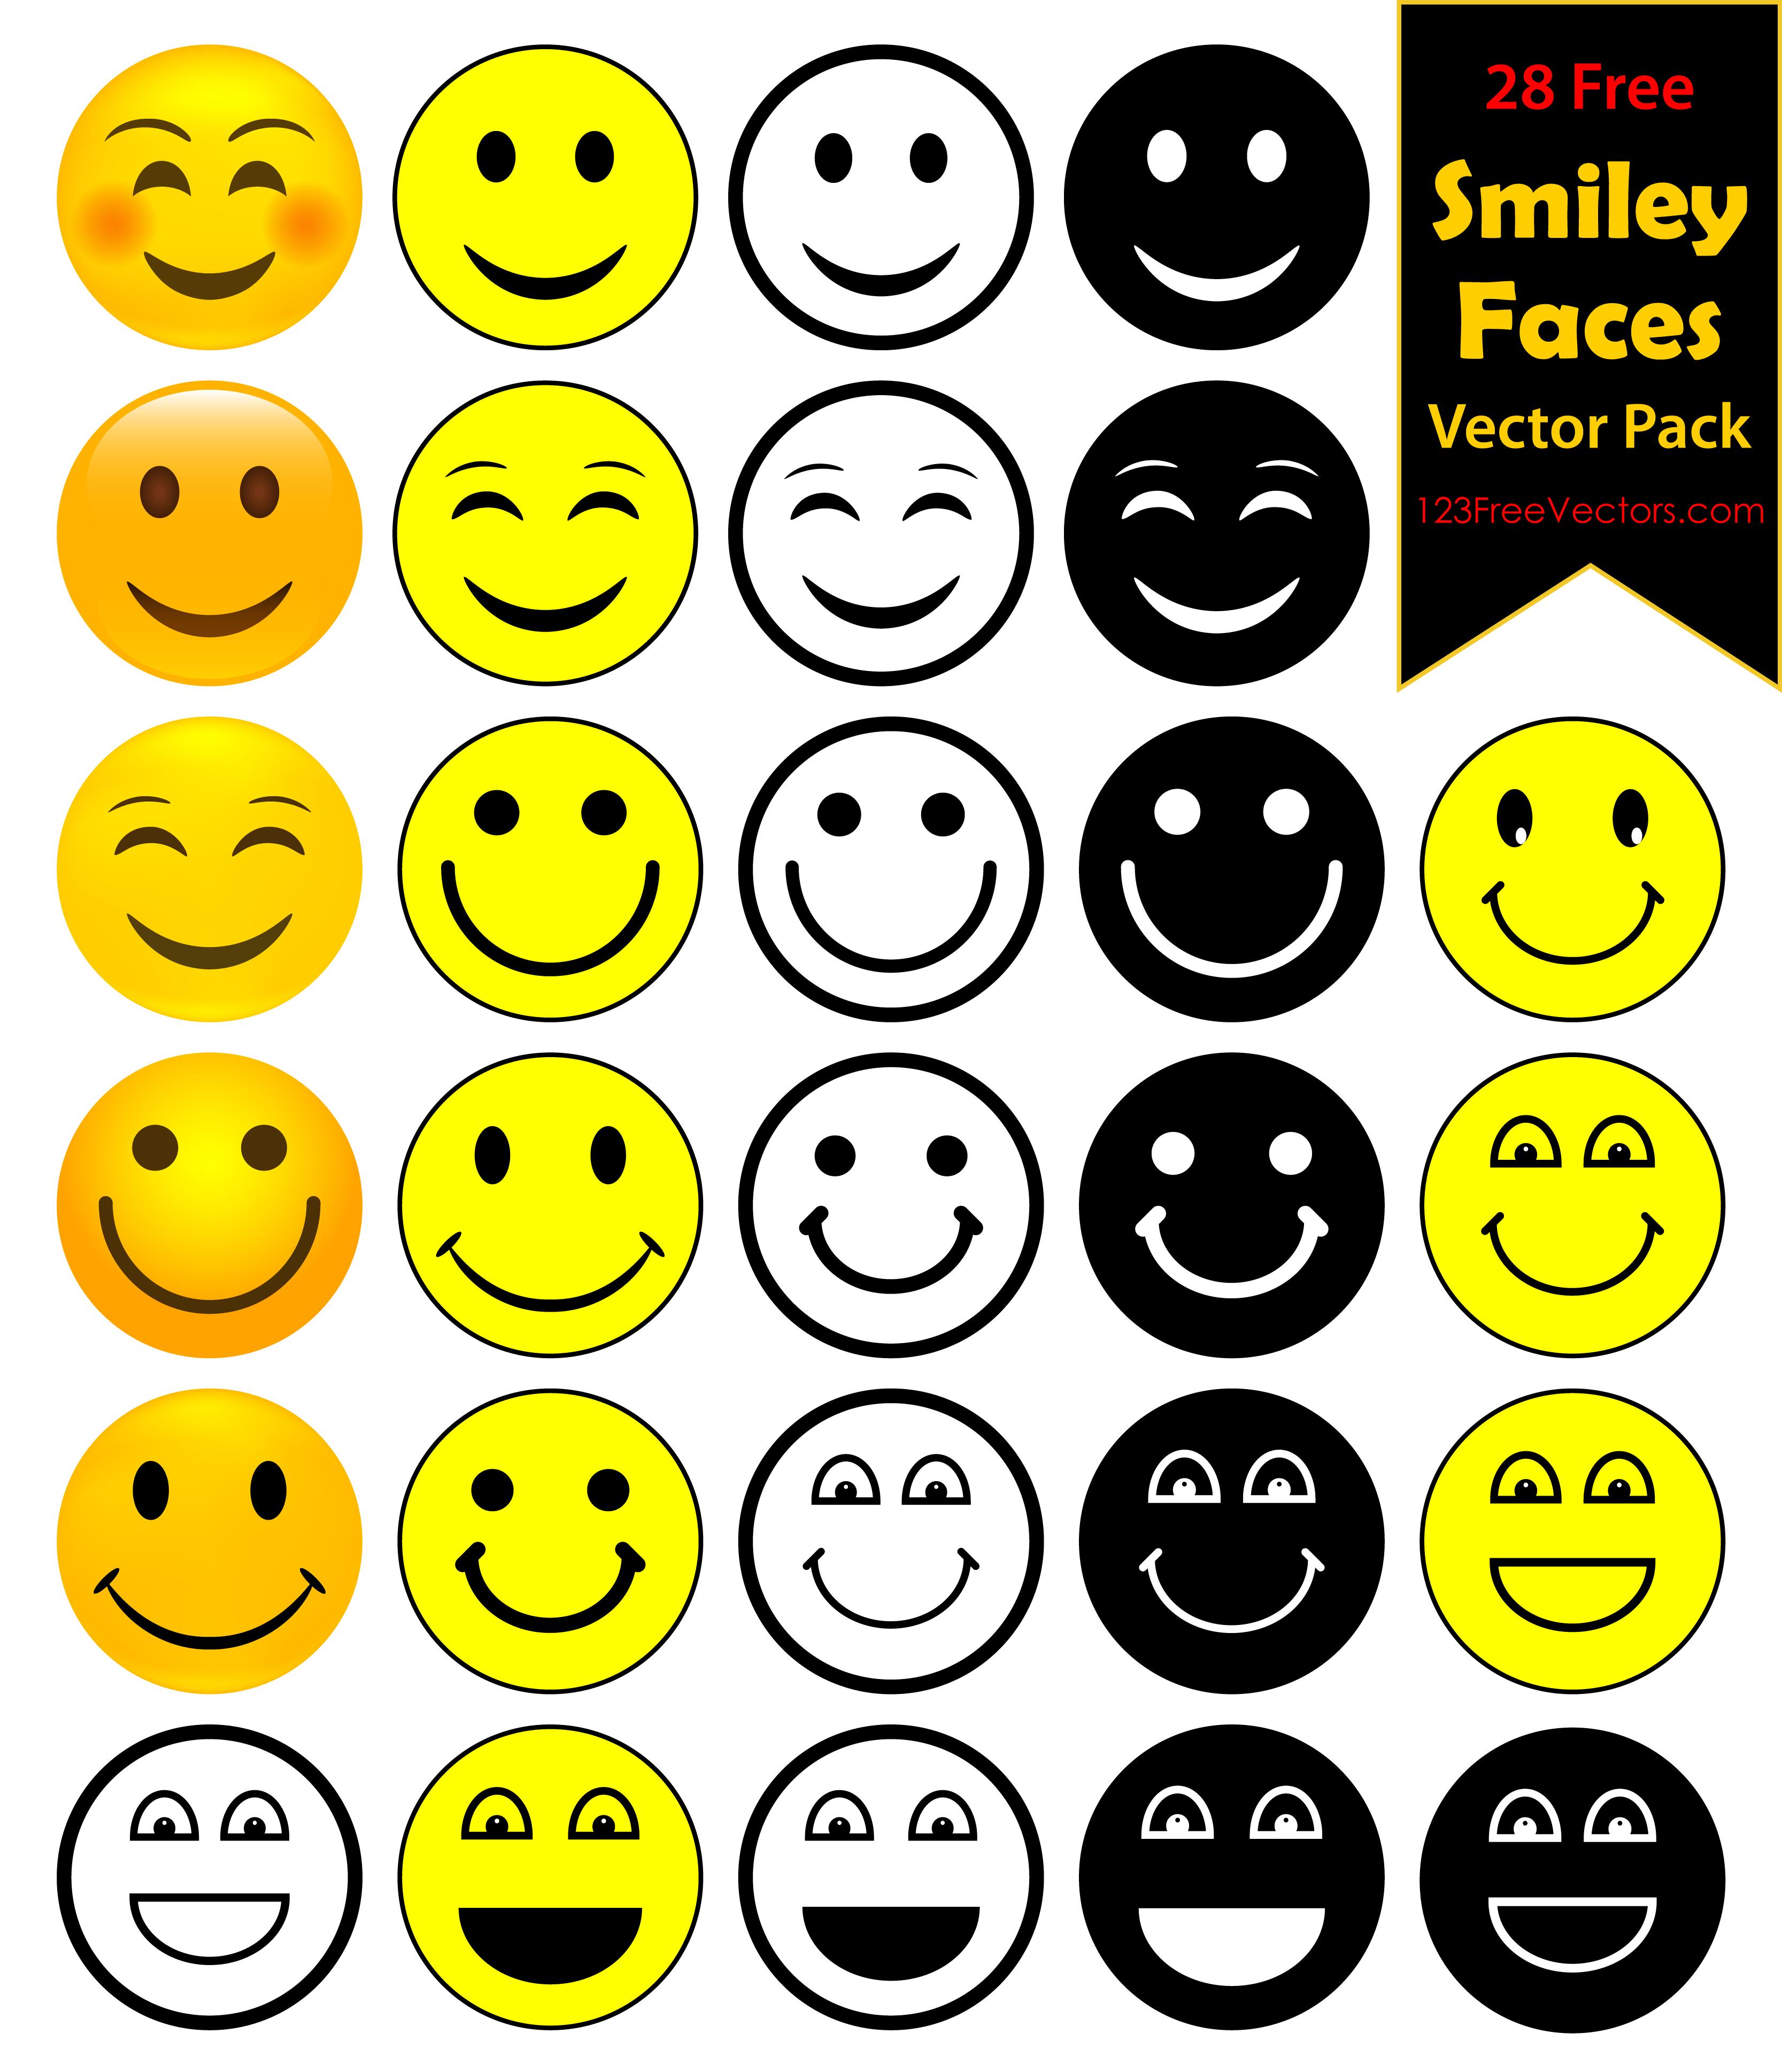 Acid Smiley Face Vector Free 123freevectors